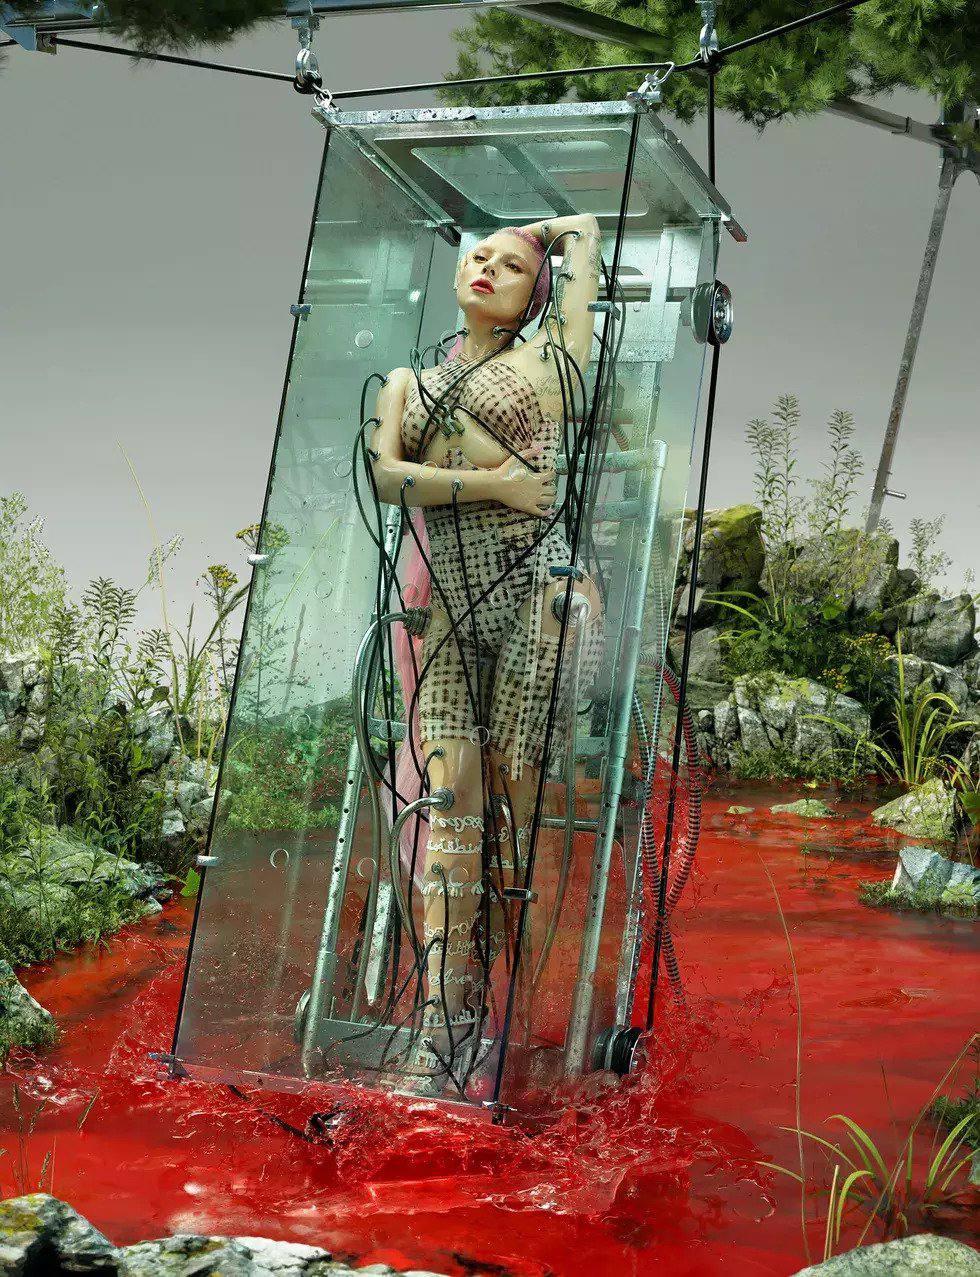 Lady Gaga Naked, Robotic Photos